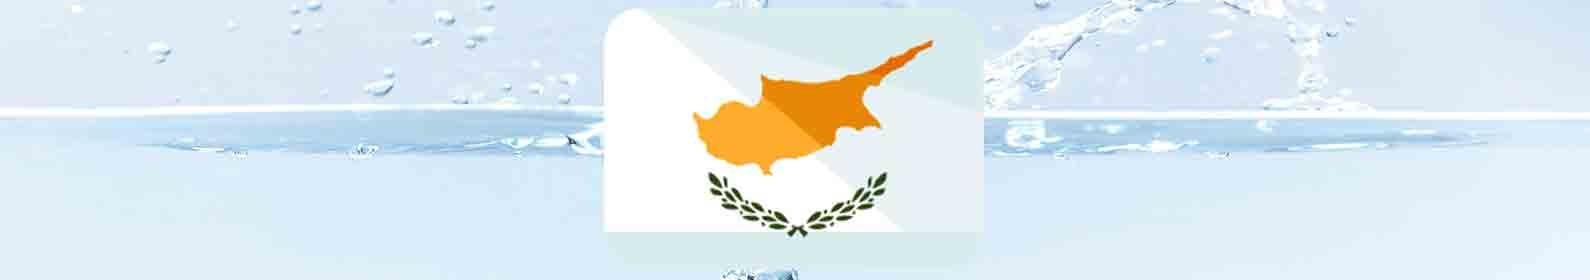 water-treatment-cyprus.jpg